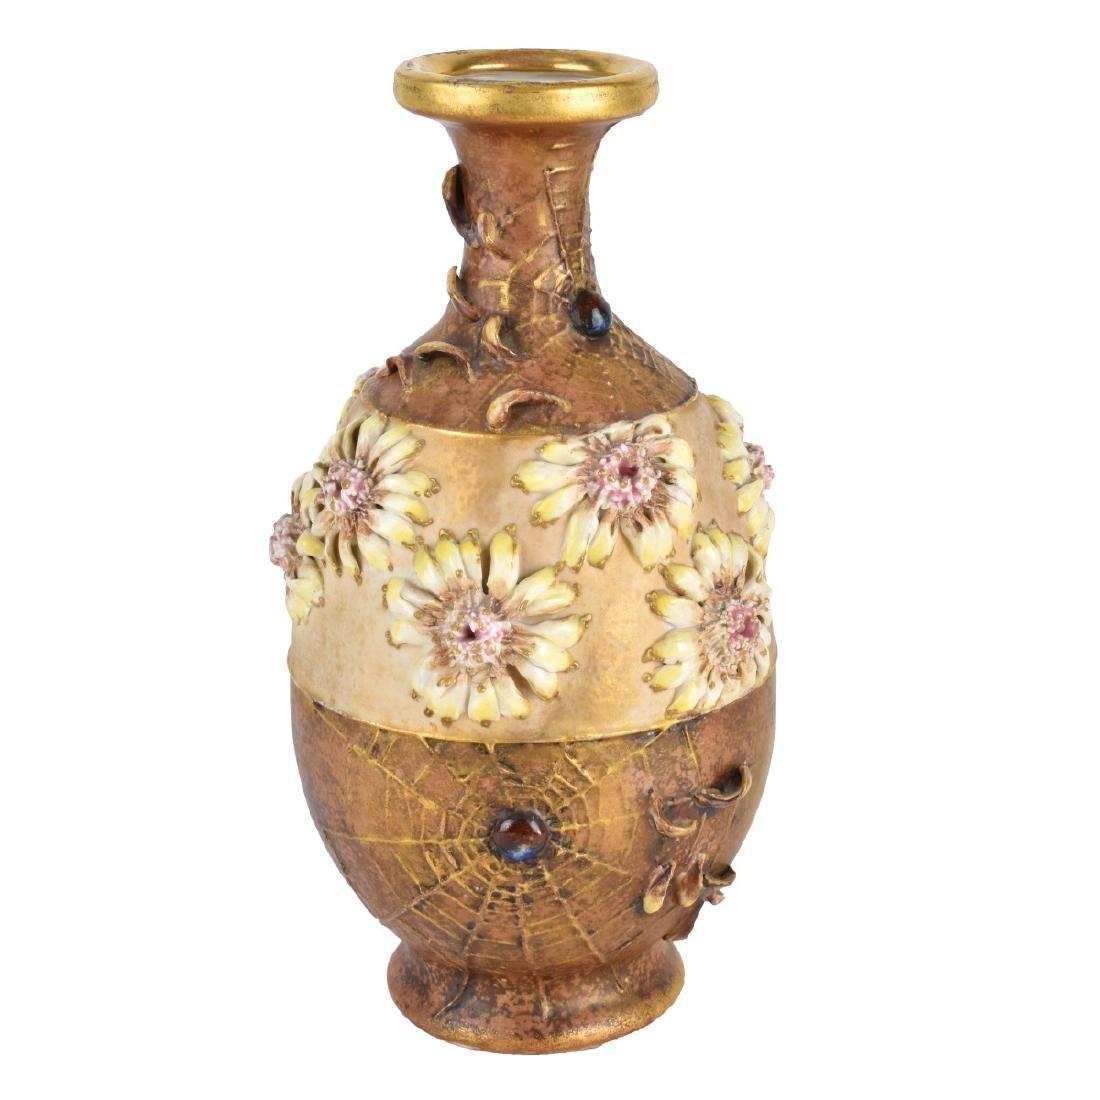 Amphora Art Nouveau Spiderweb and Daisy Vase